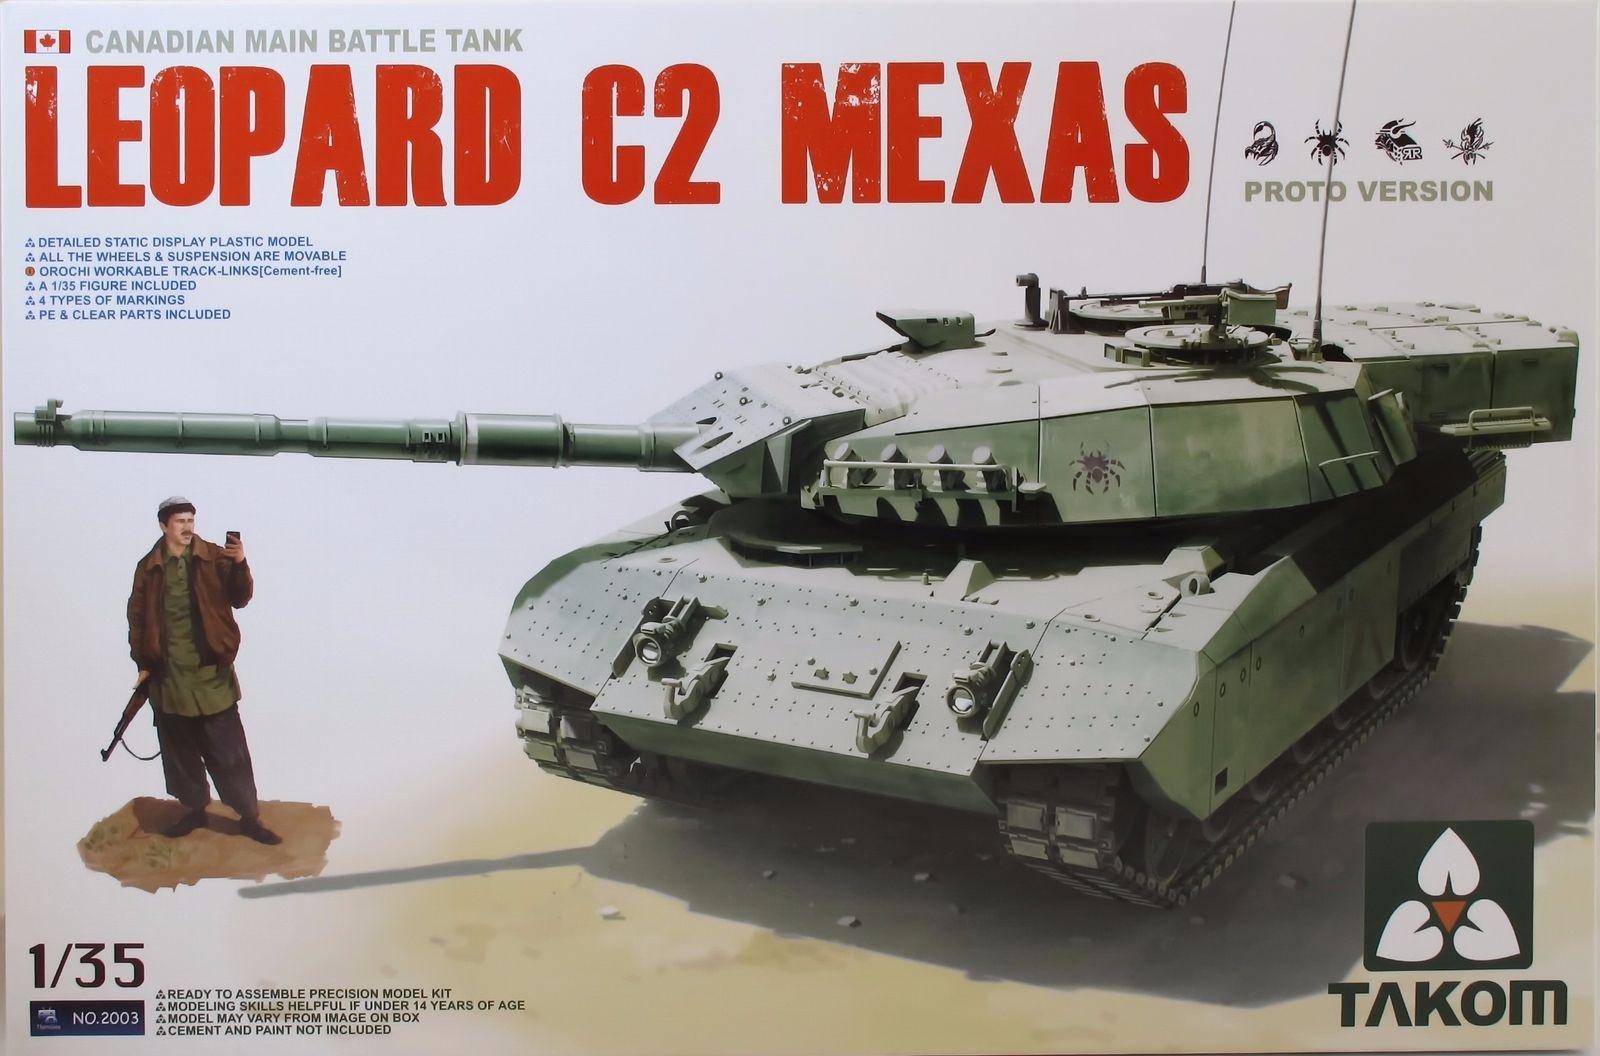 Takom 1/35 Canadian MBT Leopard C2 MEXAS (Proto Version) Tank